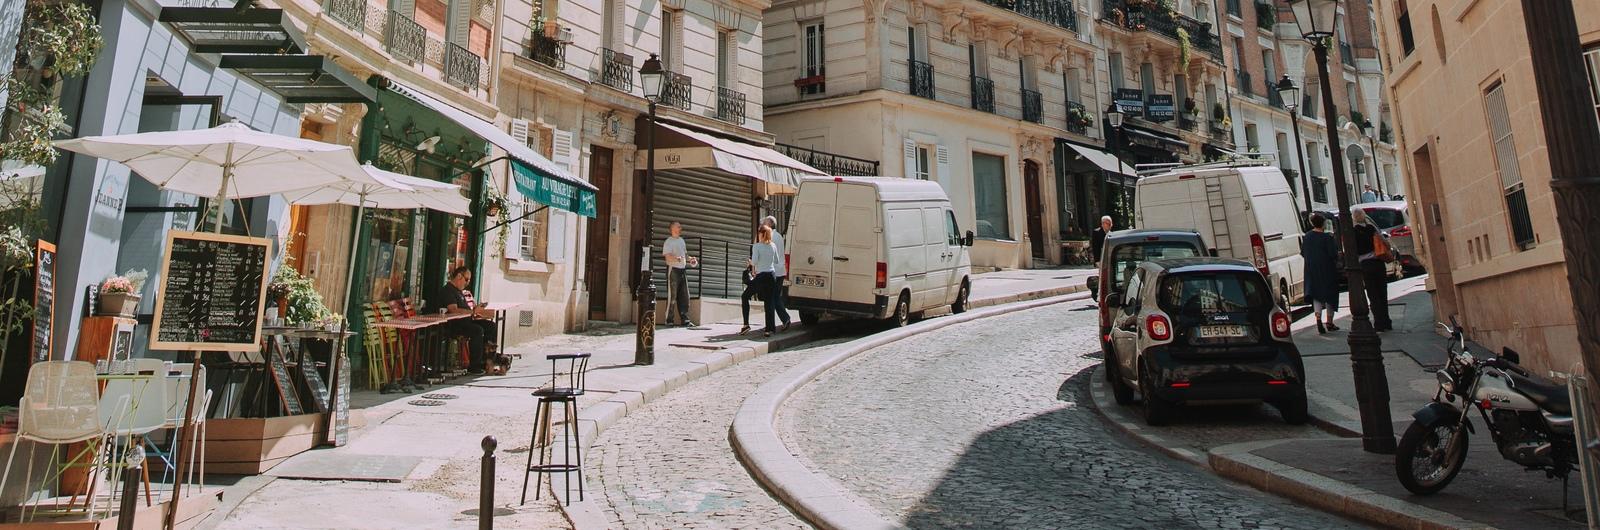 city header france street sunny